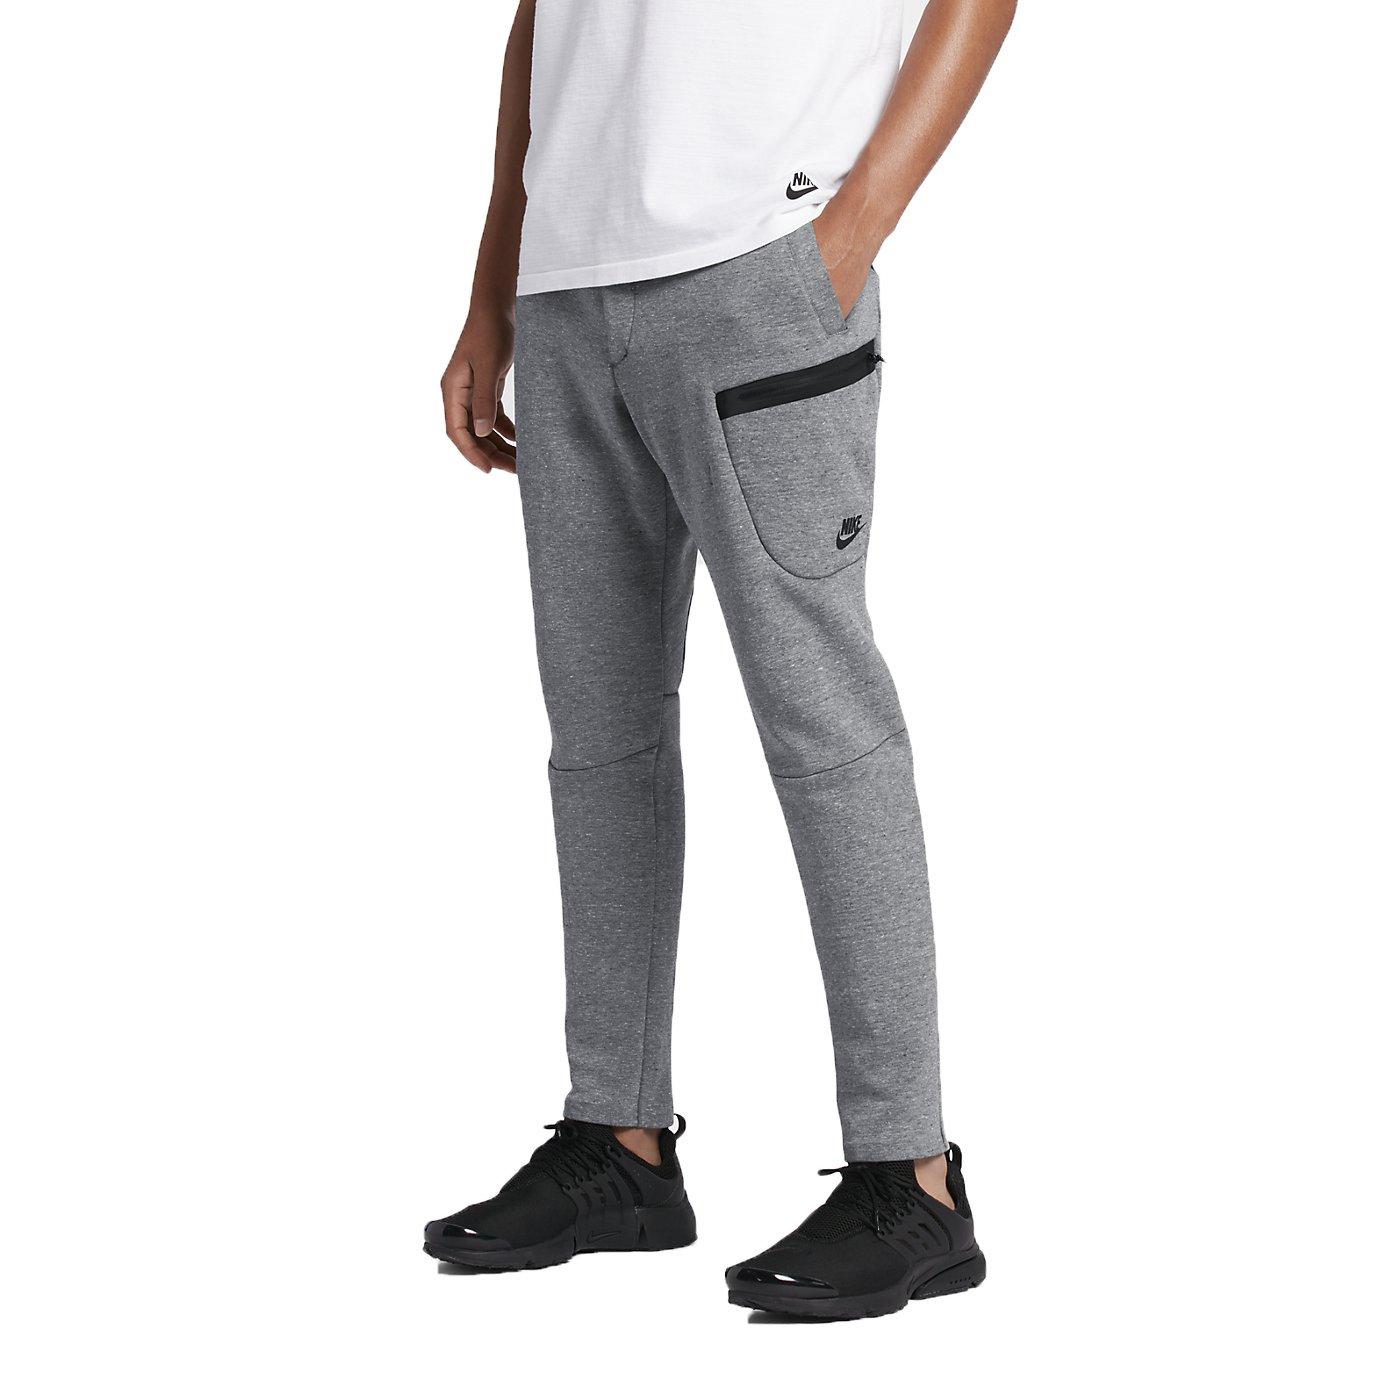 09a112f4882ccc Nike Jogginghose Sport Trainingshose Tech Fleece Gr 2XL 805219 091 Grau   Amazon.de  Bekleidung